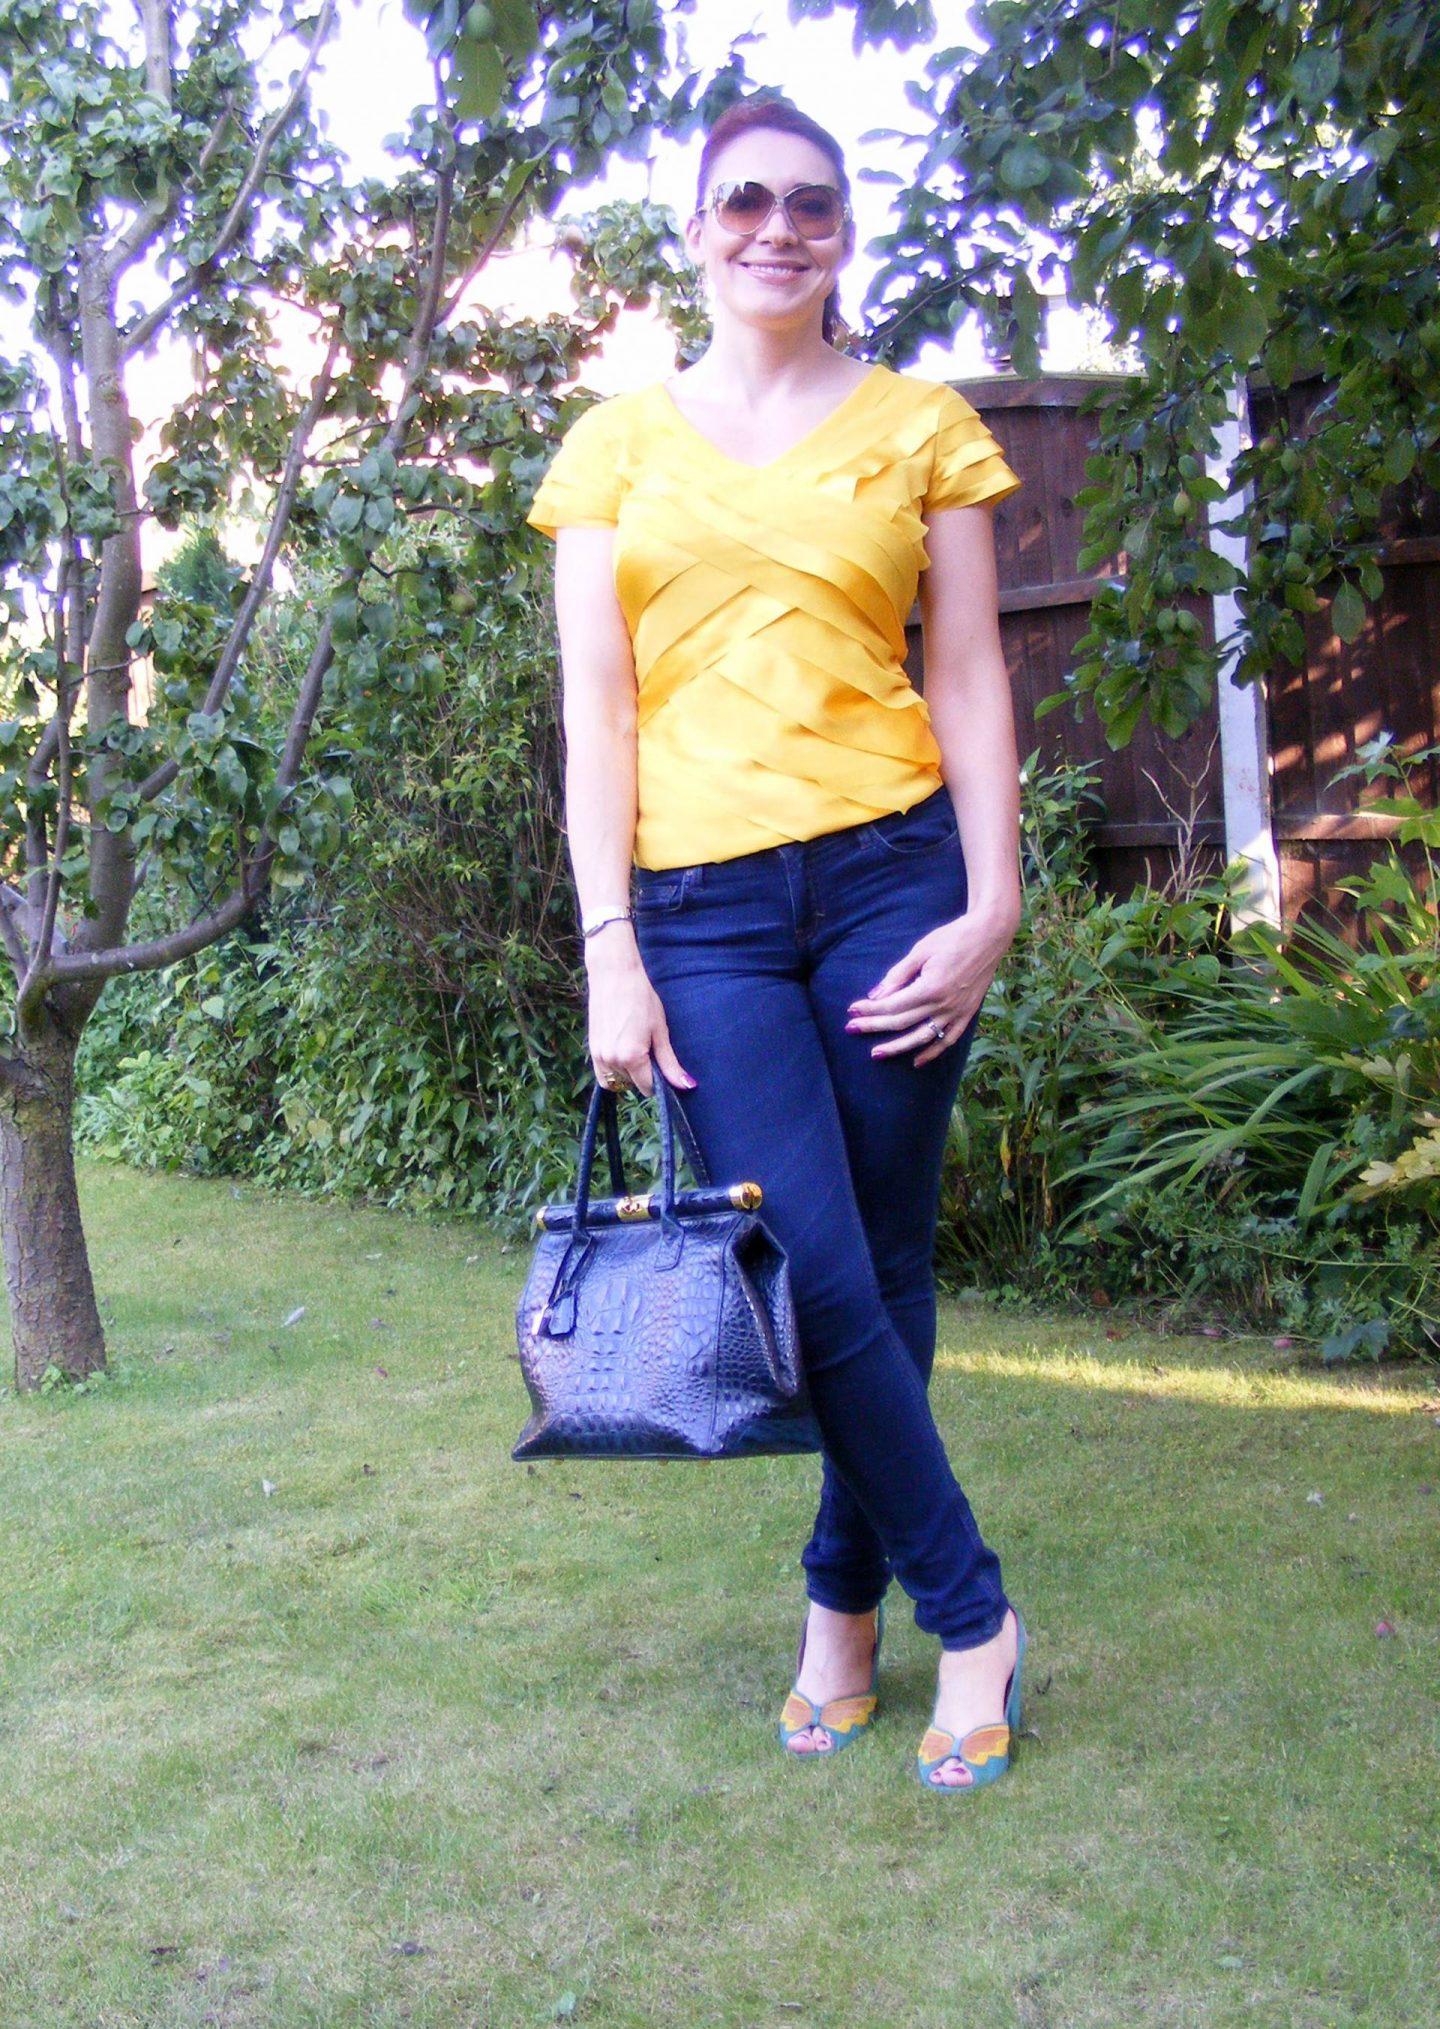 Sunshine and Blue Sky, Ben de Lisi for Principles yellow top